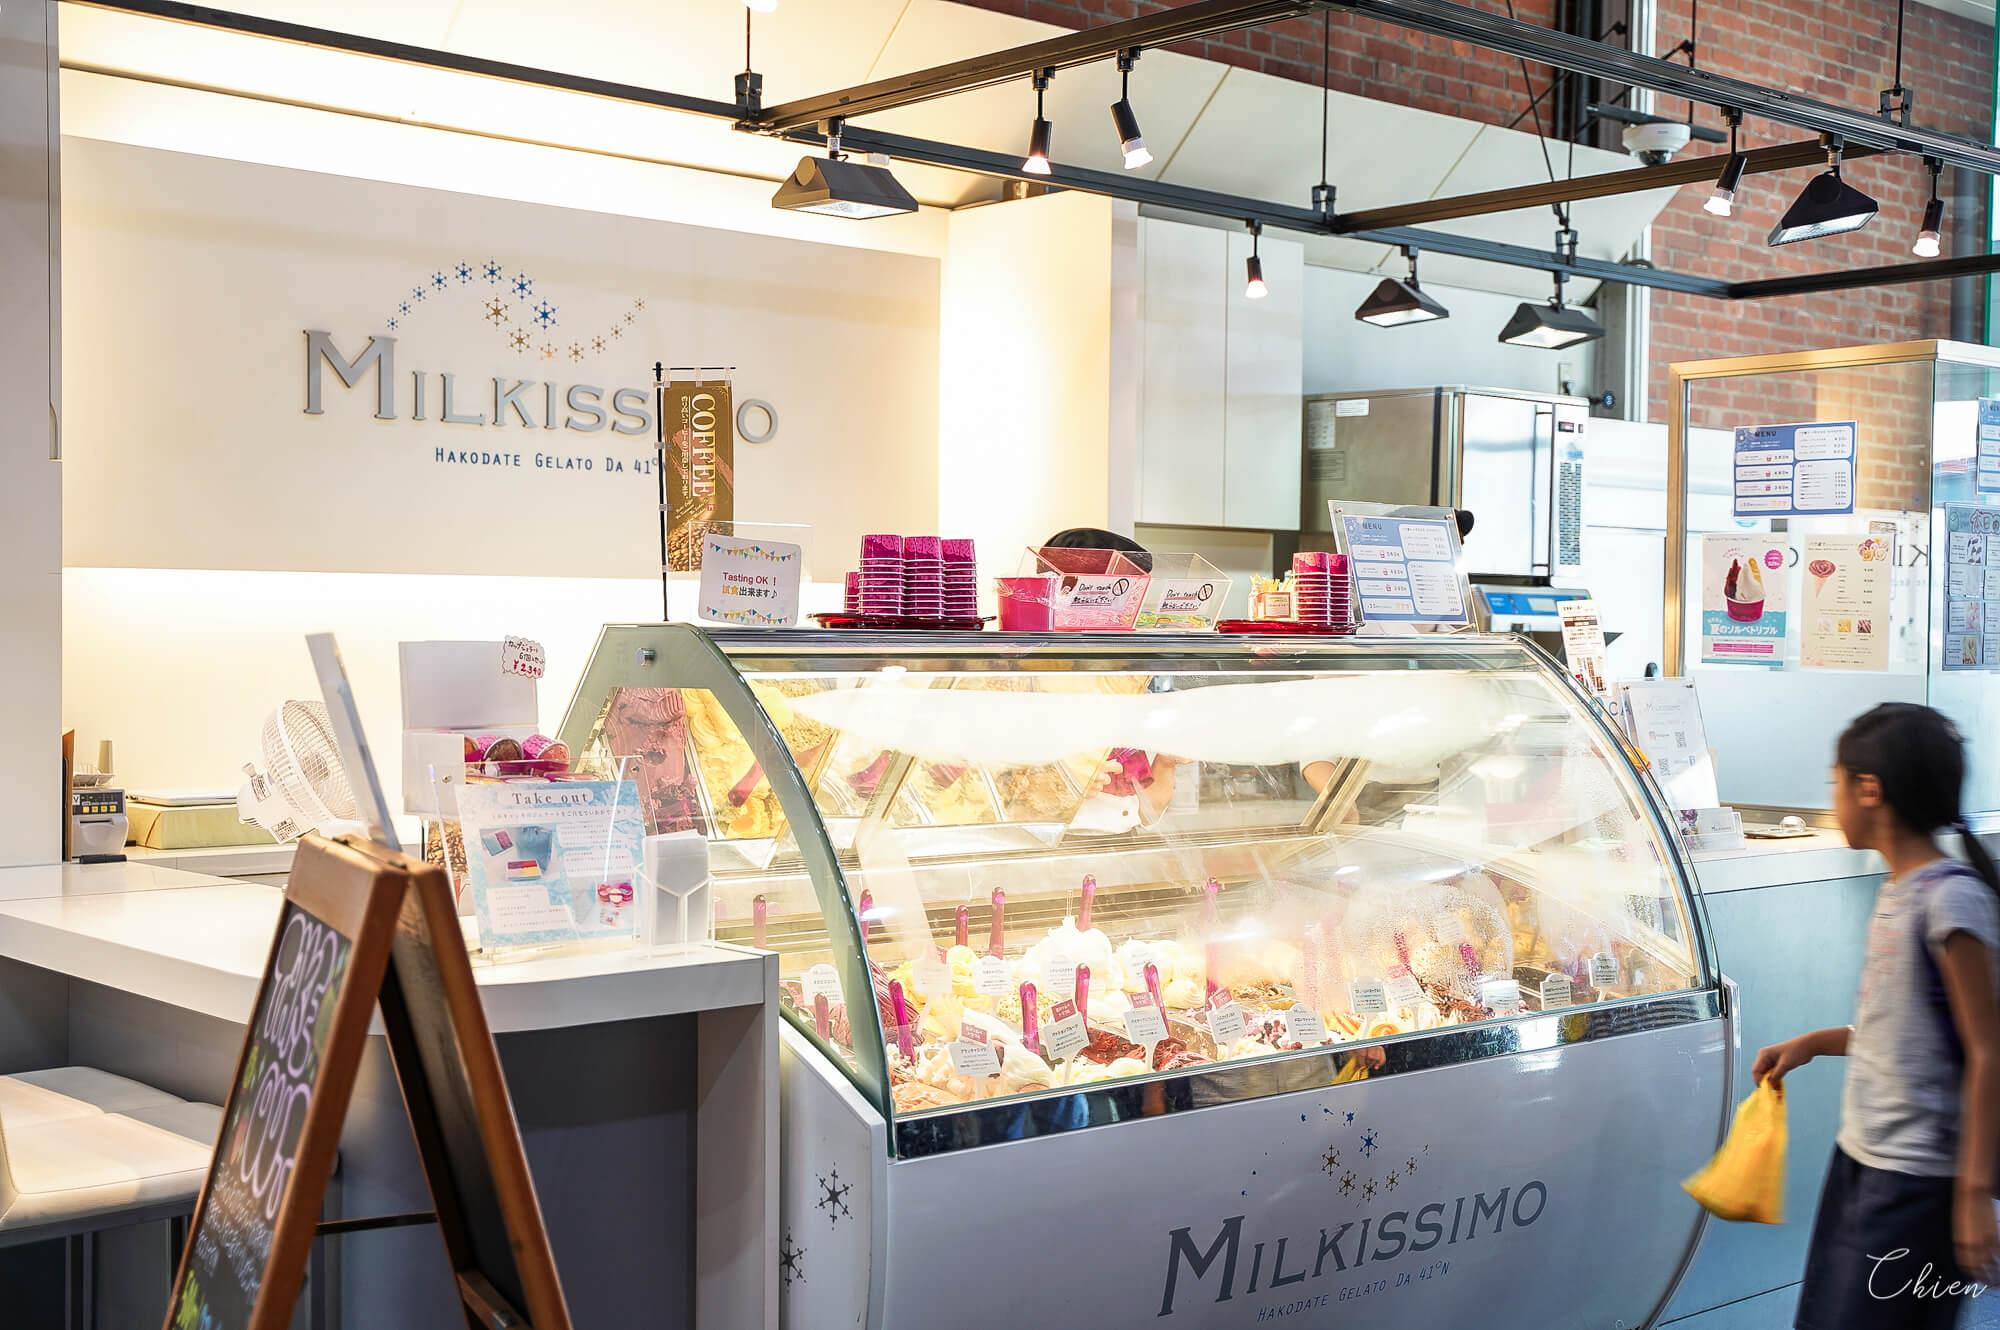 MILKISSIMO函館義式冰淇淋 本店